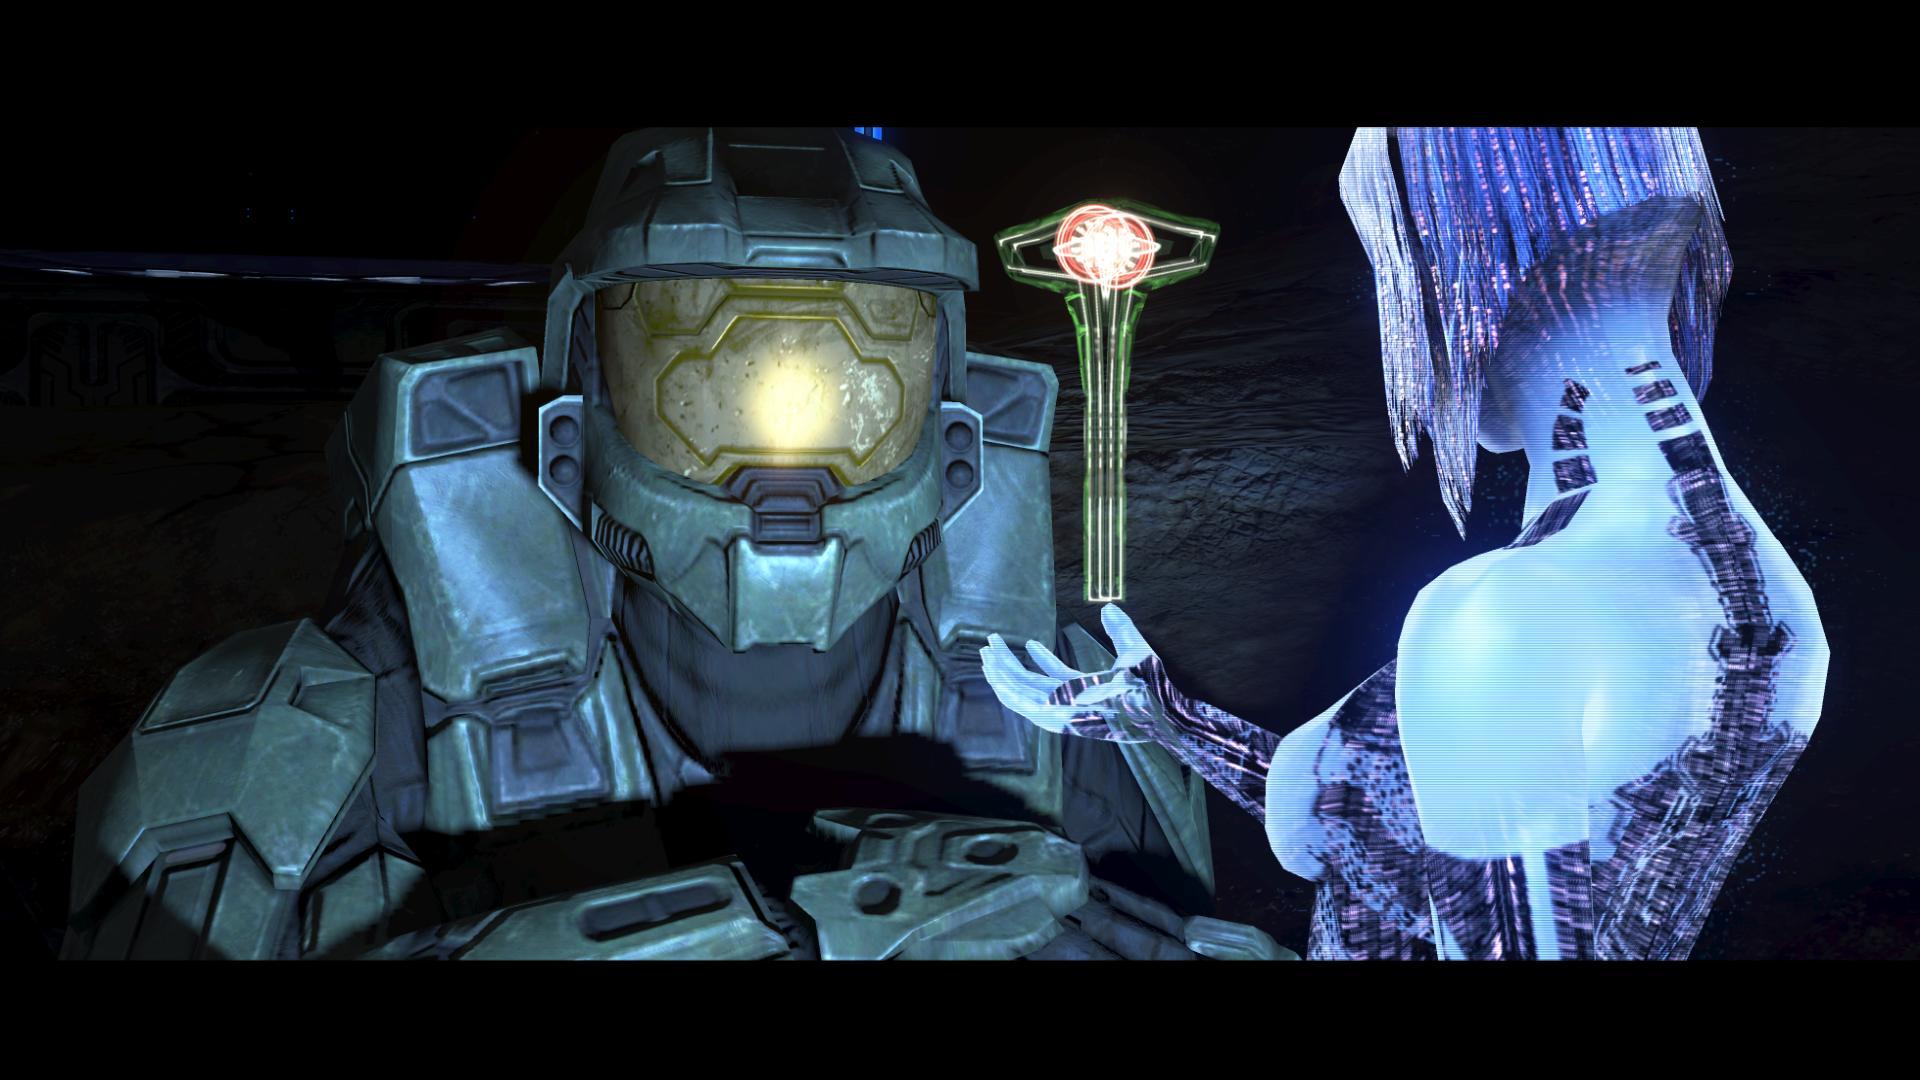 Halo 3 Hd Wallpaper Background Image 1920x1080 Id 75150